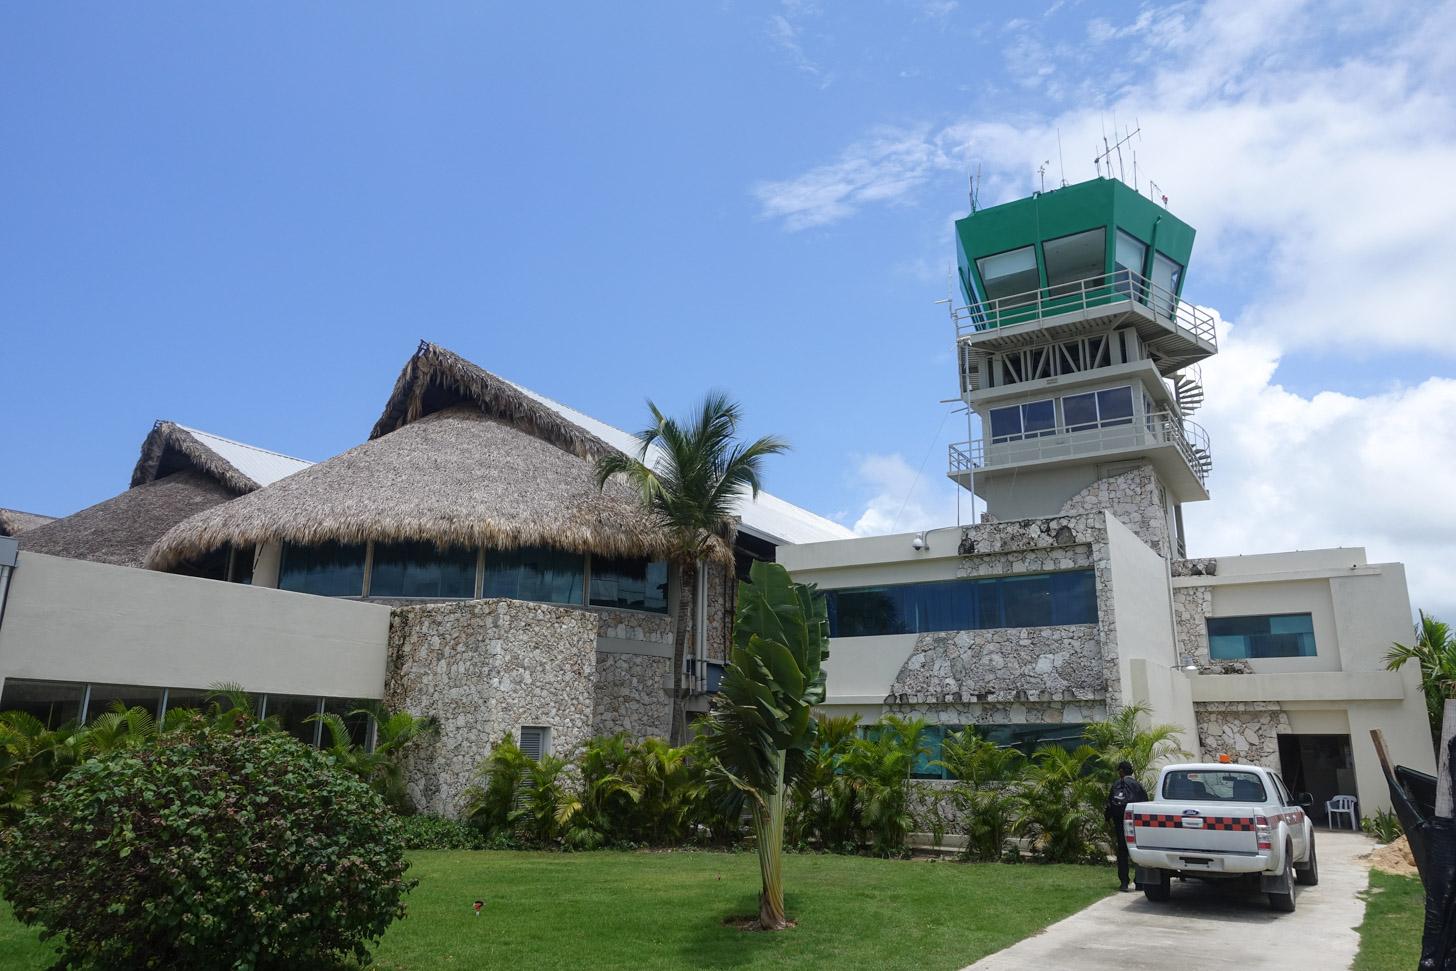 Het internationale vliegveld van Punta Cana